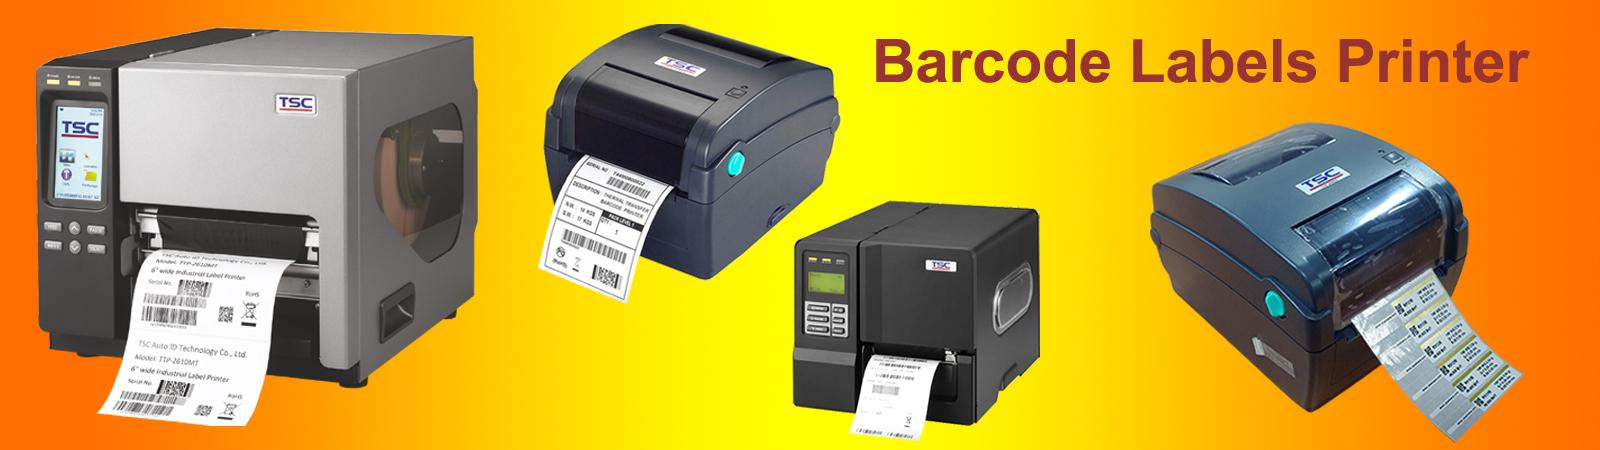 Barcode Labels Printer